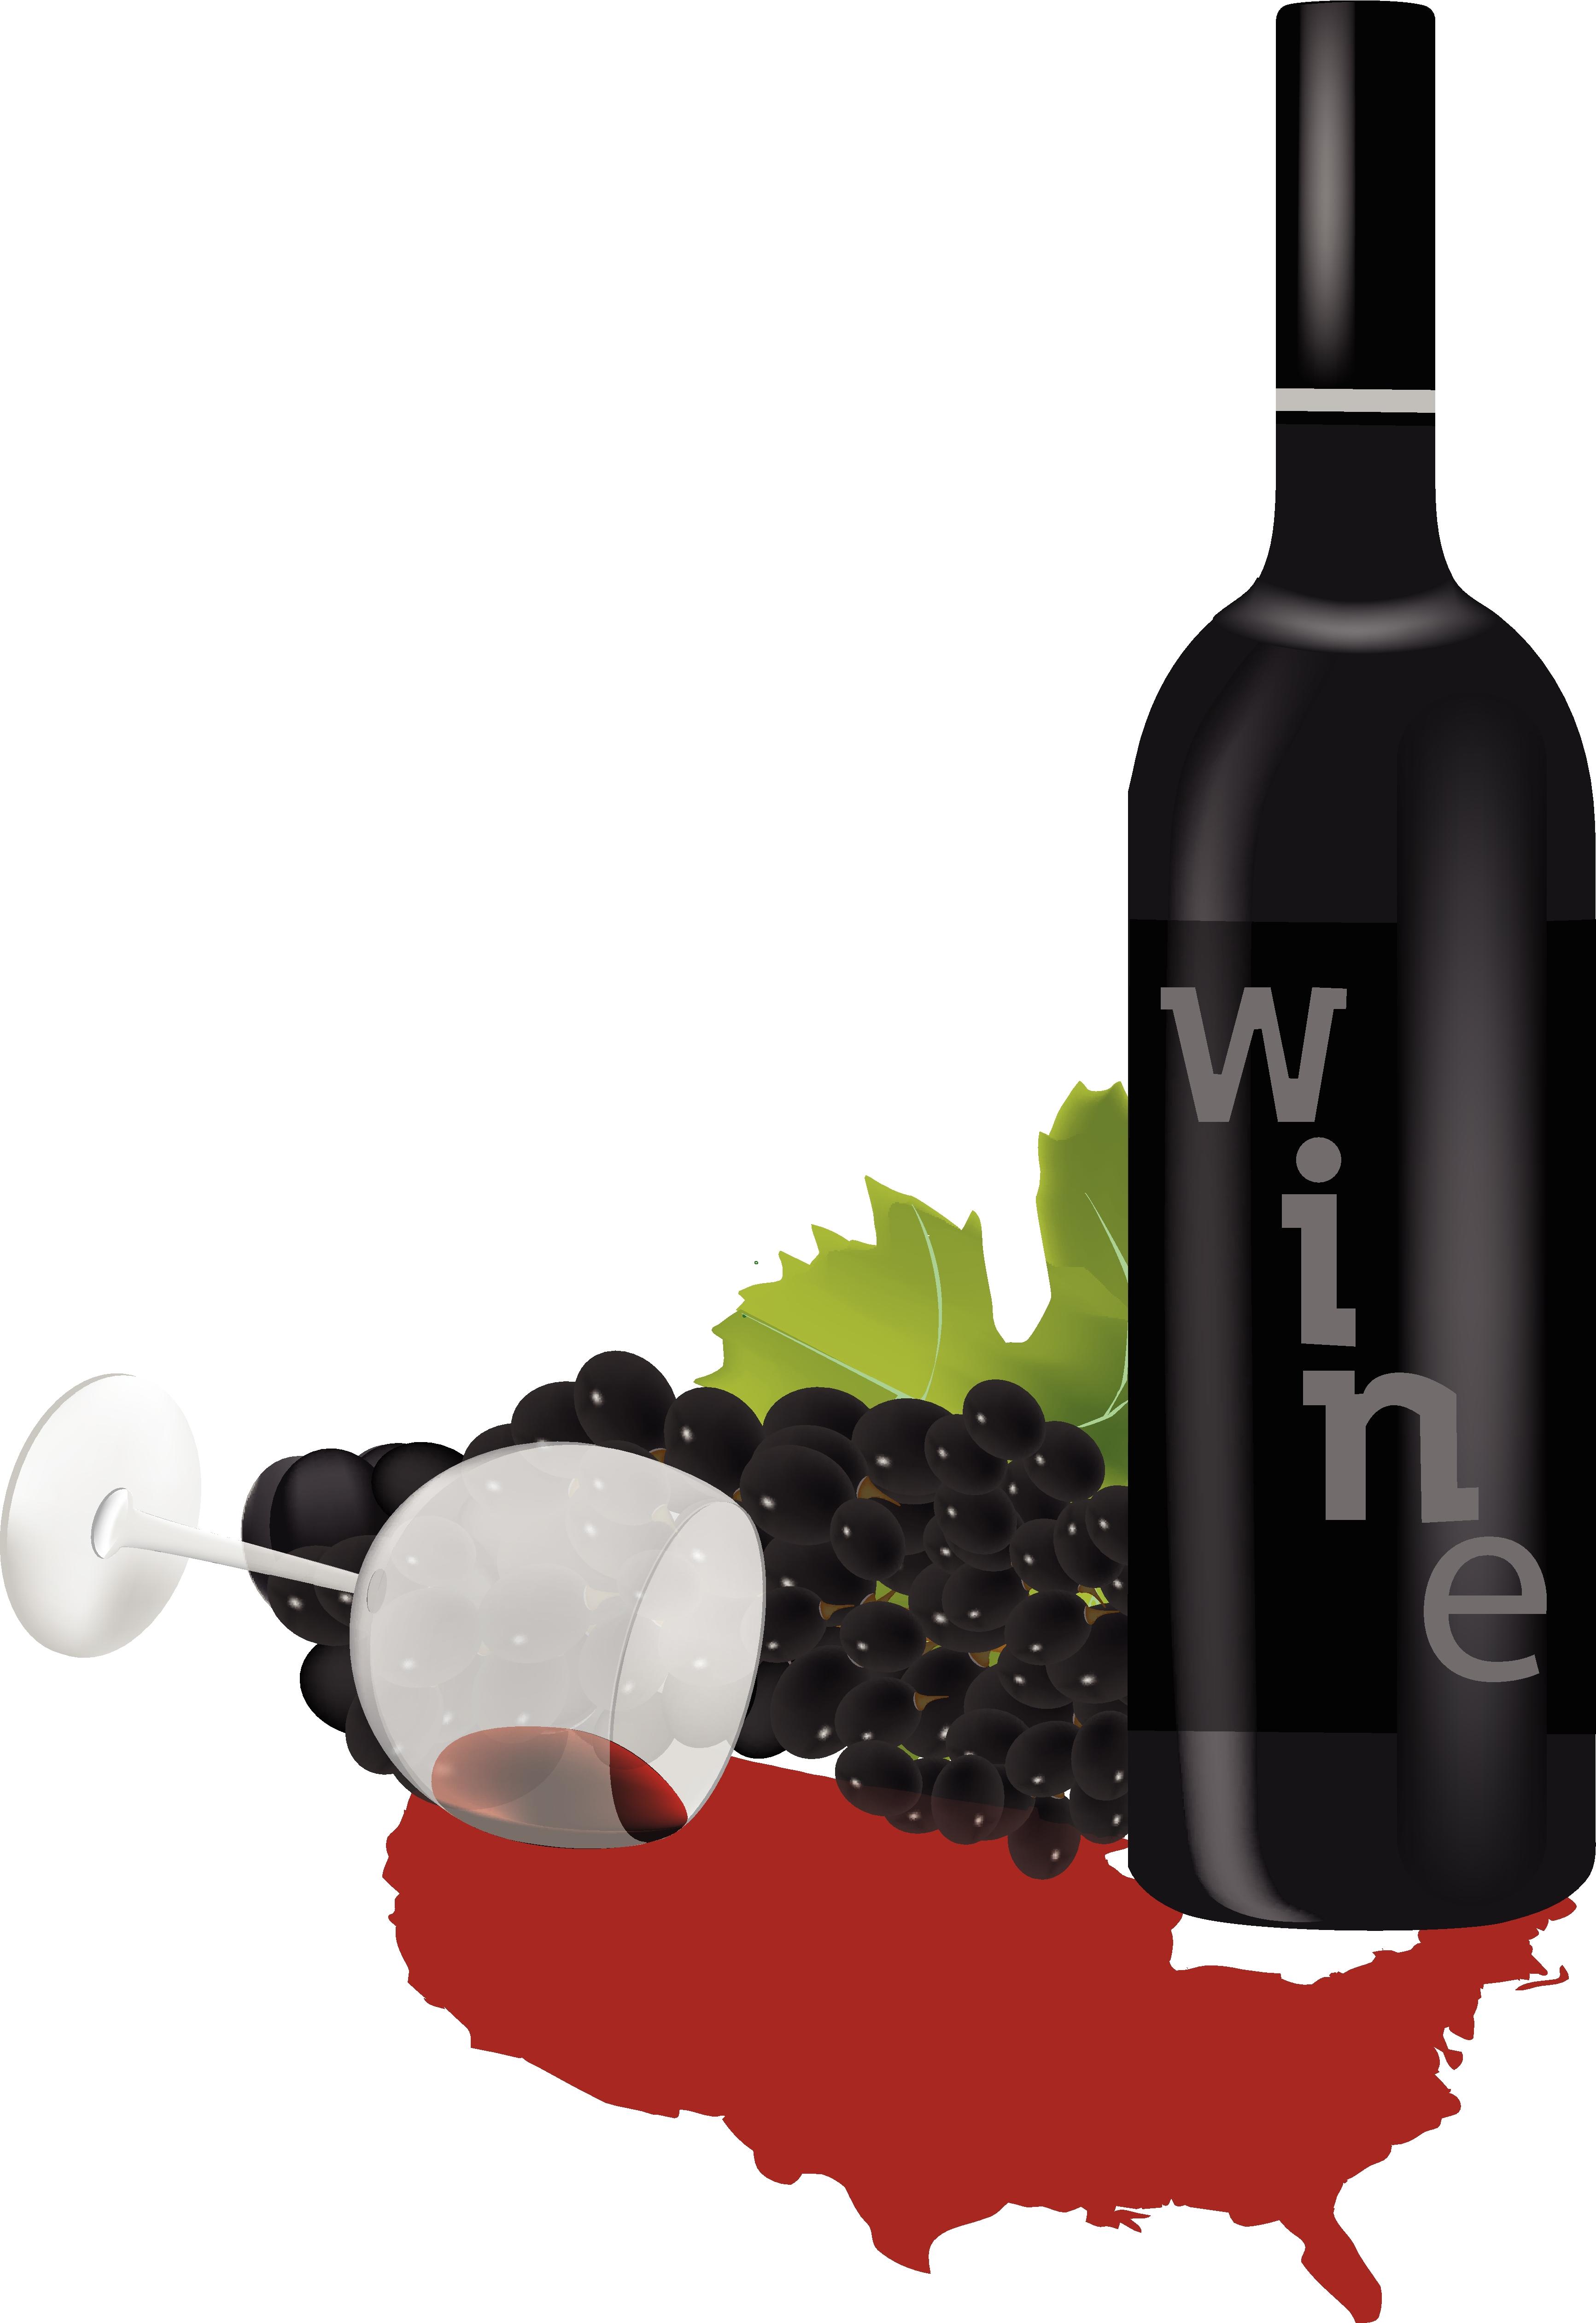 American Wine Dinner – July 26 at 7 p.m.